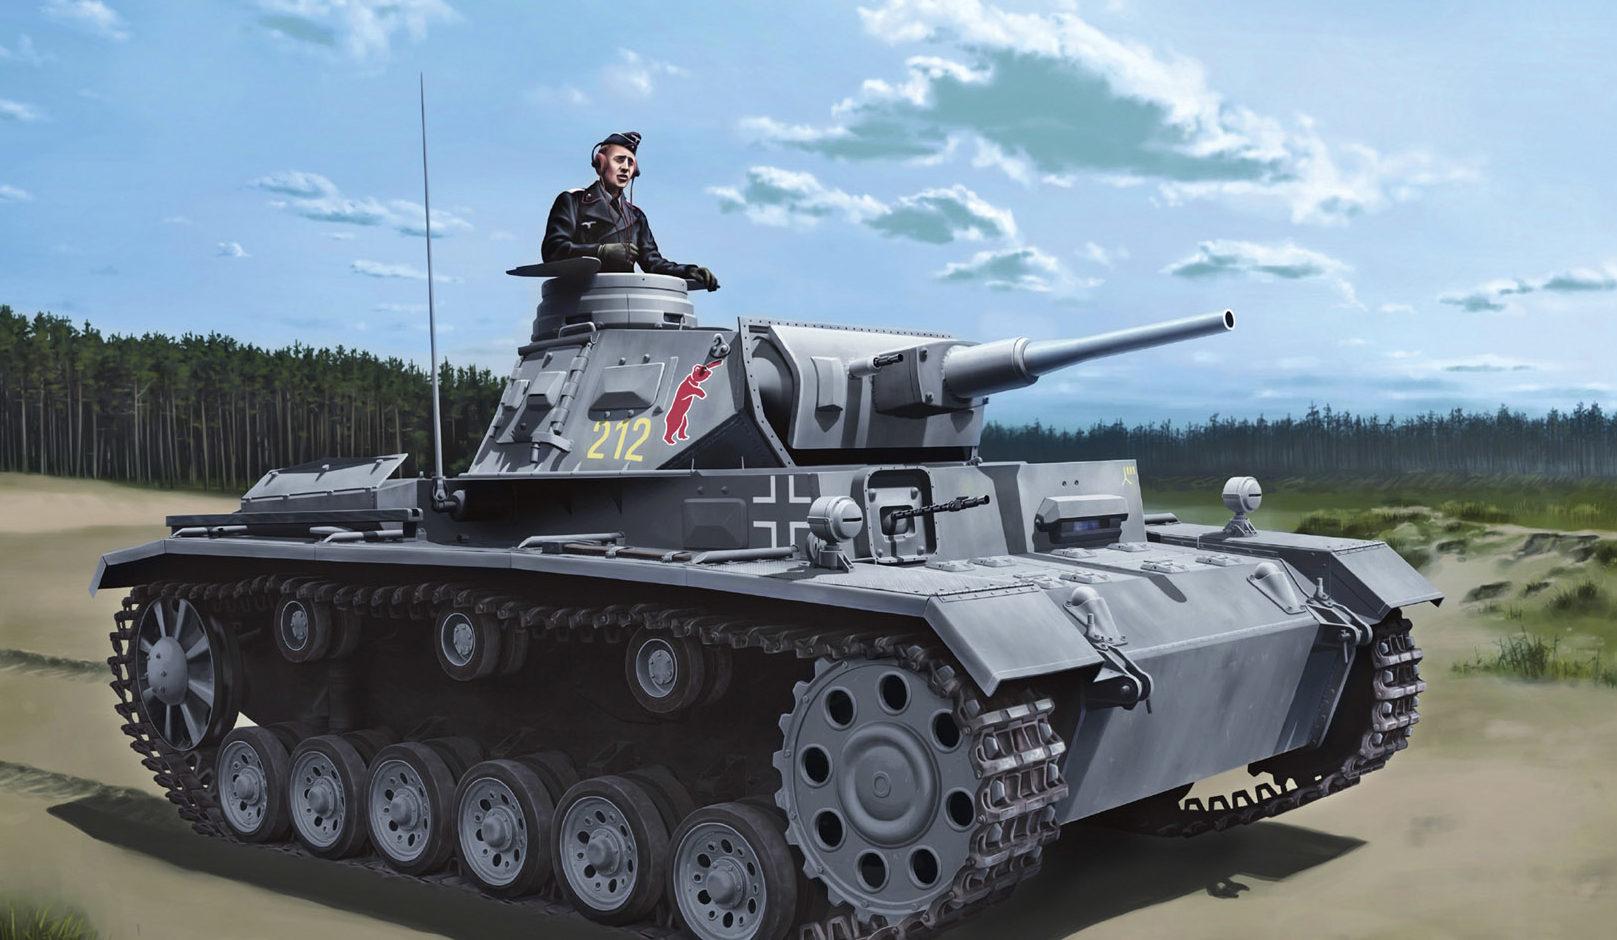 Zierfuss Filip. Танк Pz.Kpfw.III (5cm) (T) Ausf.G.